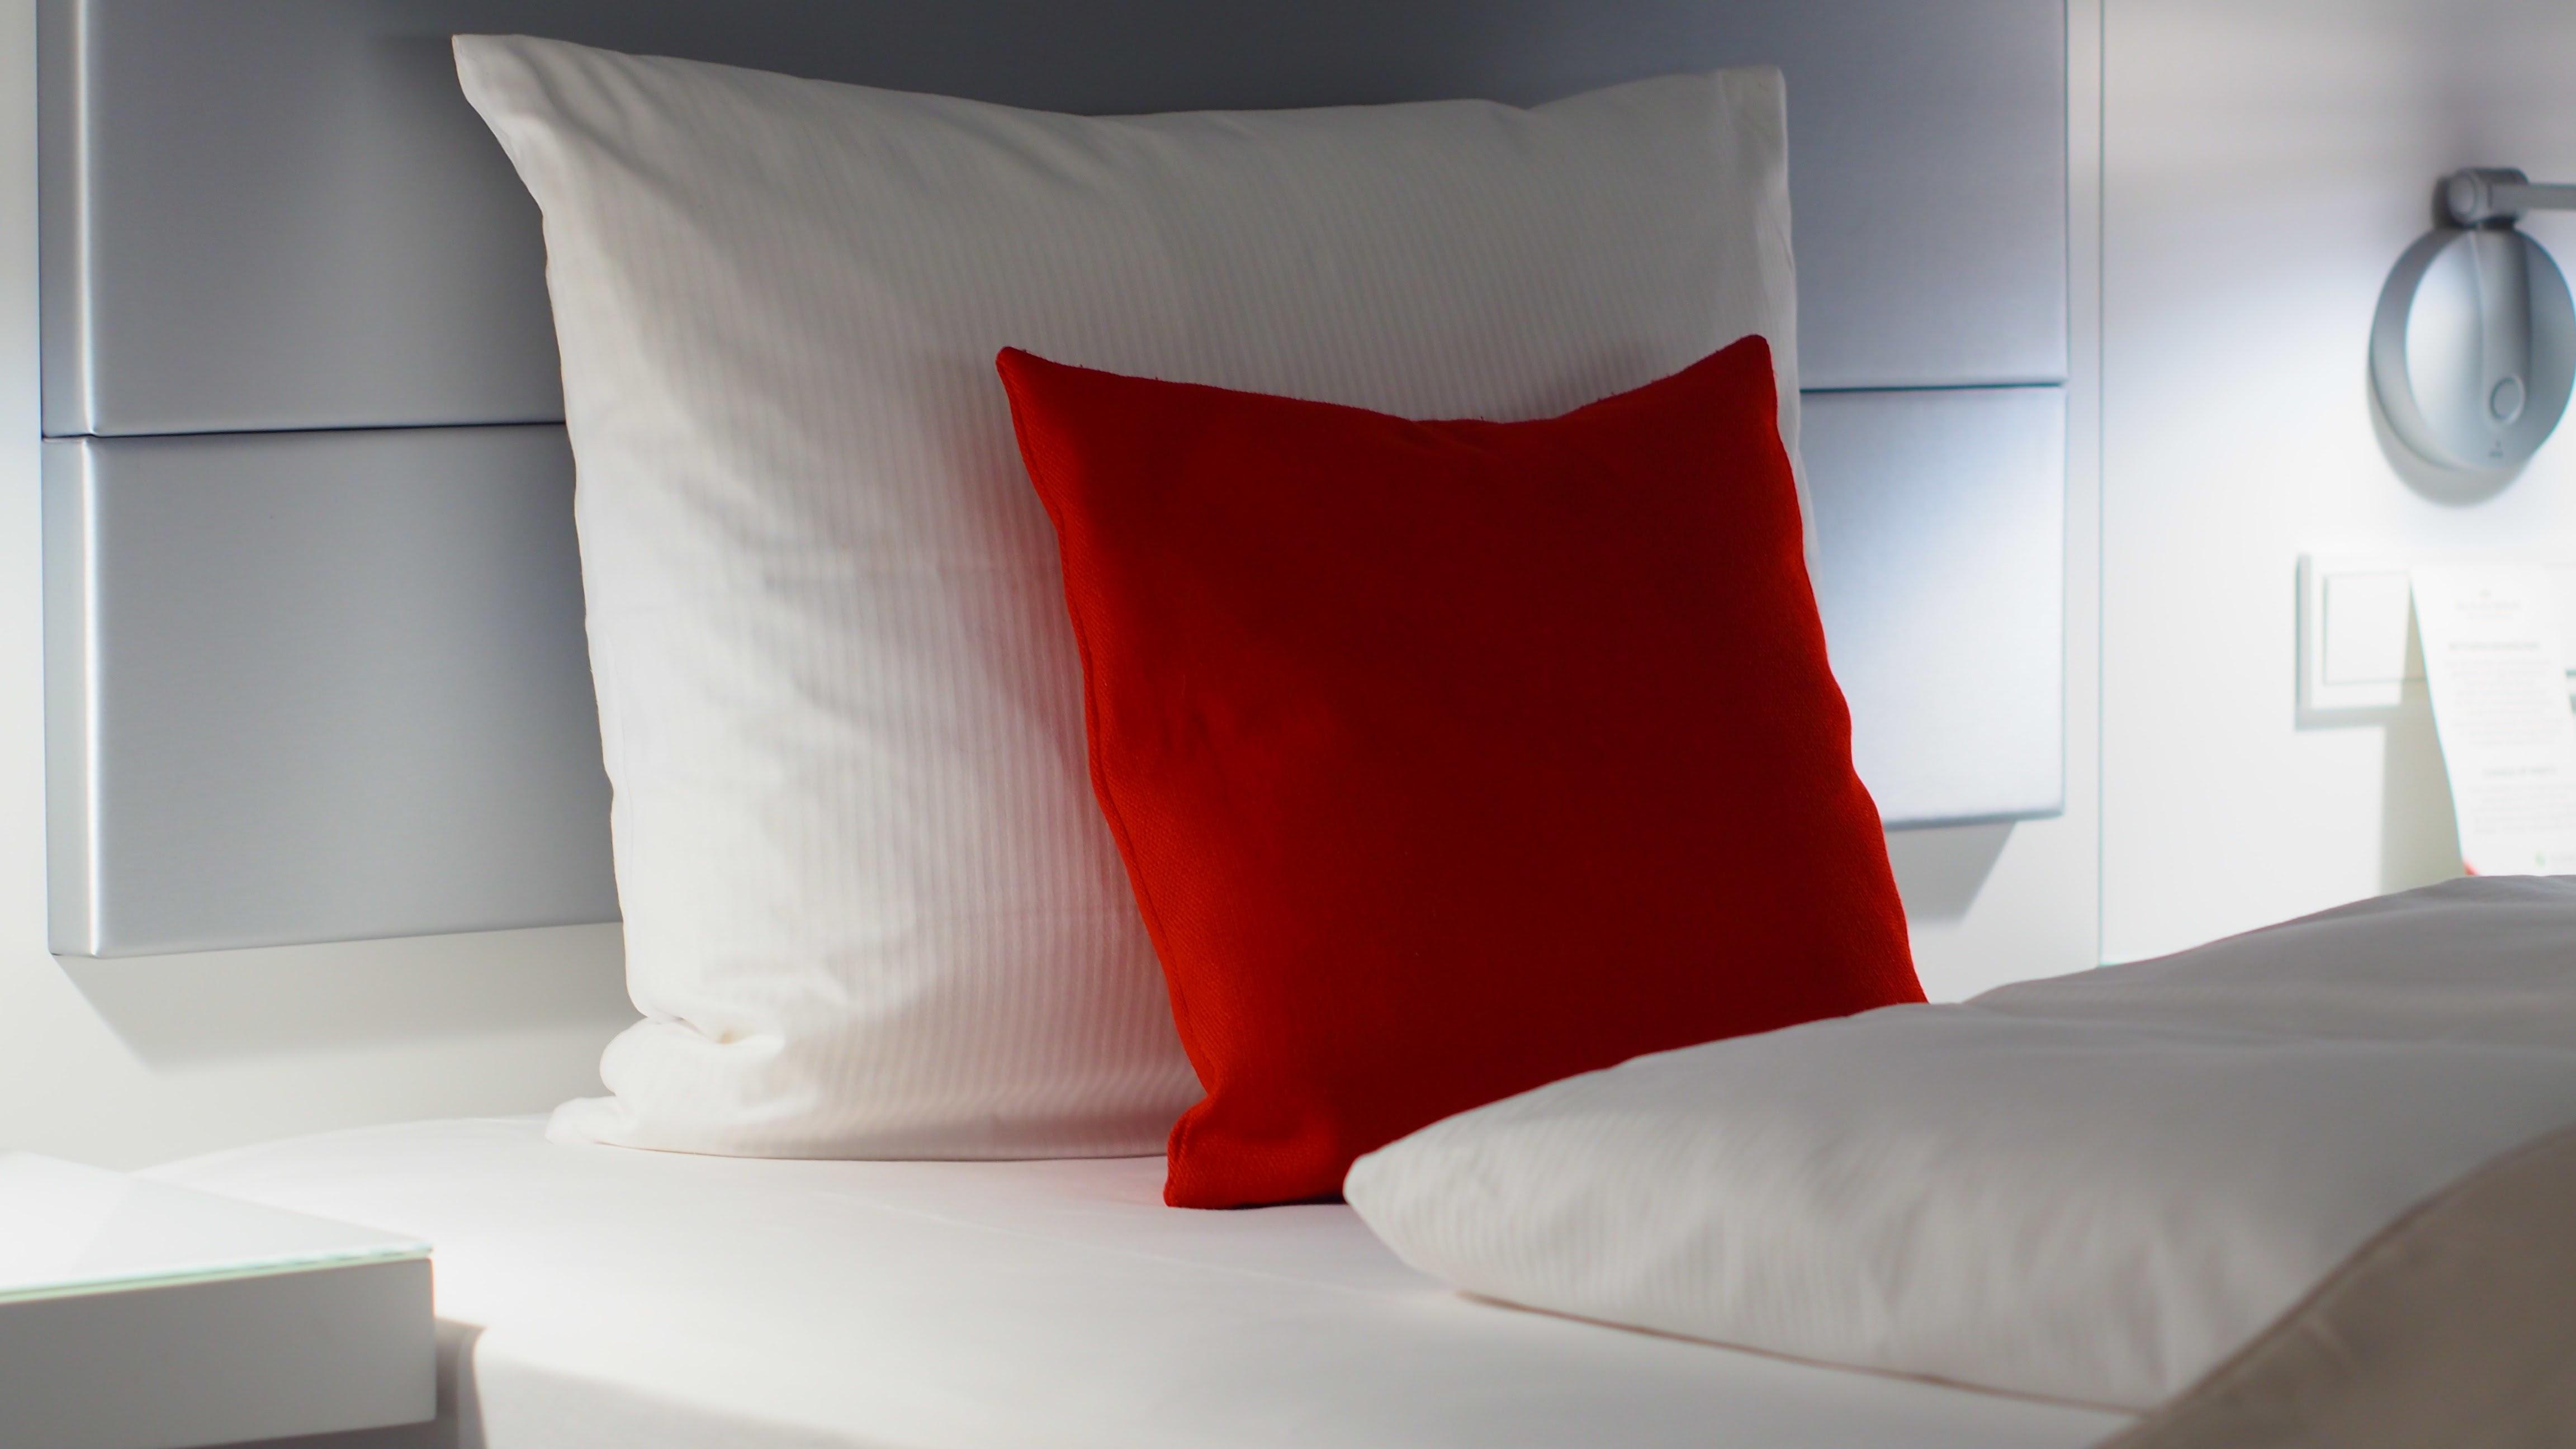 Køb skumgummi til madrasser og hobbyskum i god kvalitet her